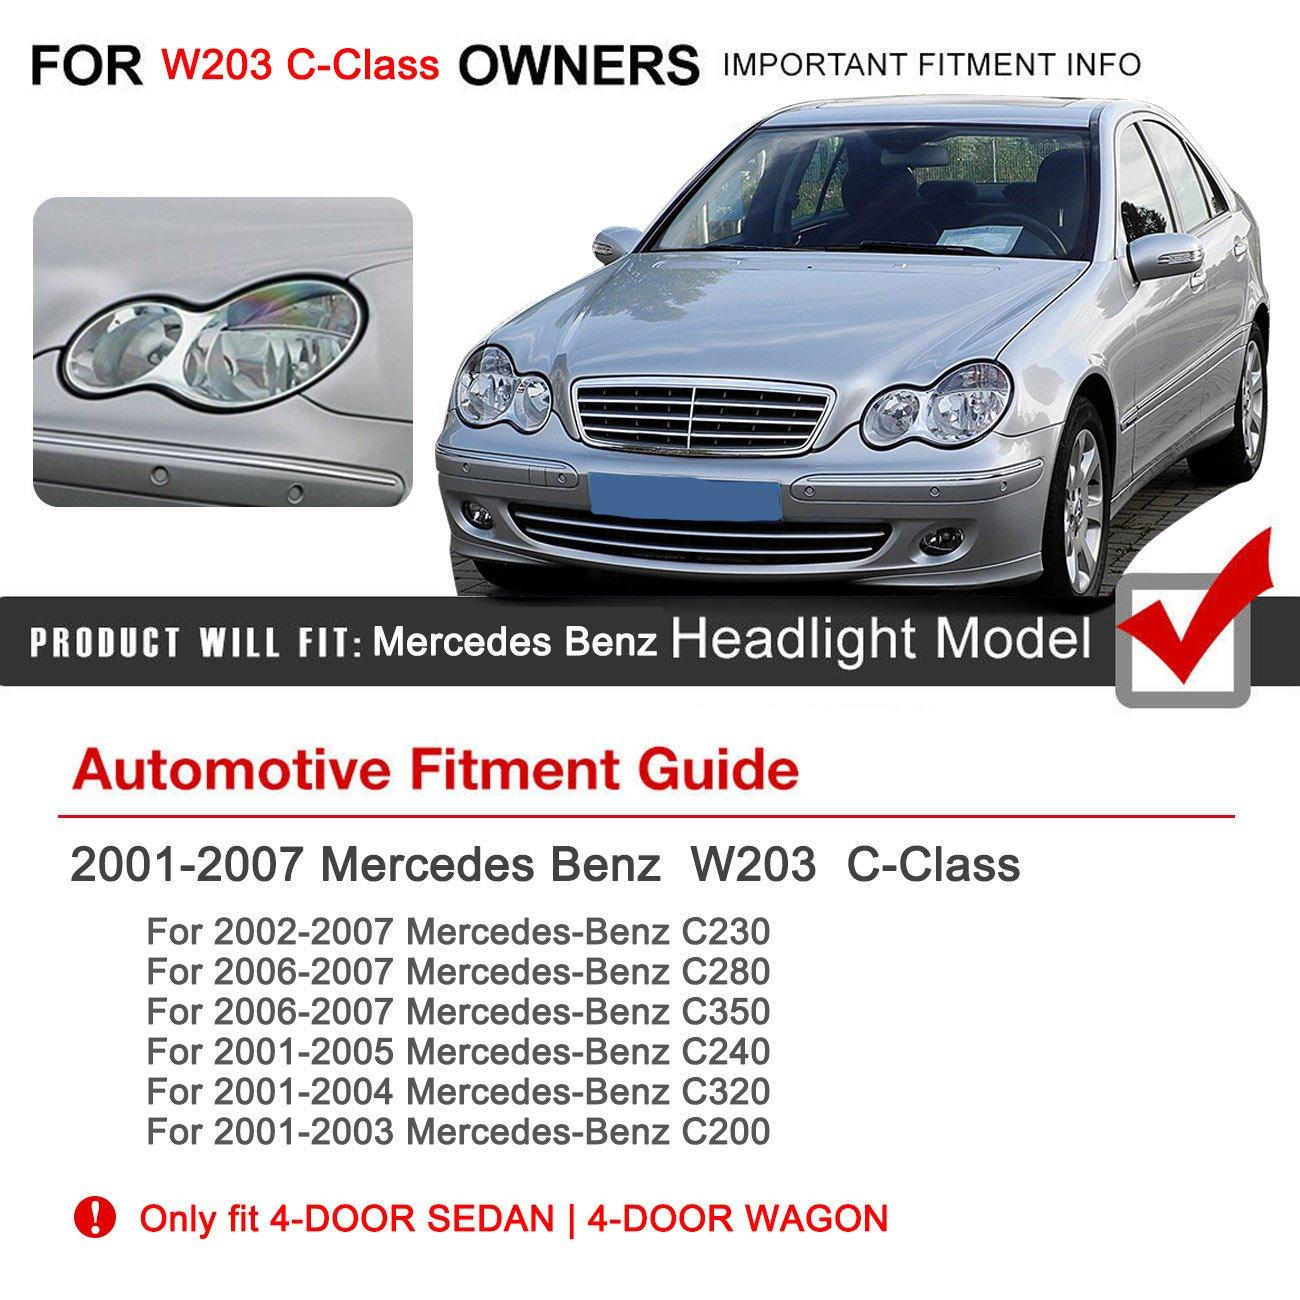 amazon e most left side headlight lens plastic shell cover for 2003 Mercedes Benz E320 amazon e most left side headlight lens plastic shell cover for 2001 2007 4 door mercedes benz w203 c class c230 c280 c350 automotive